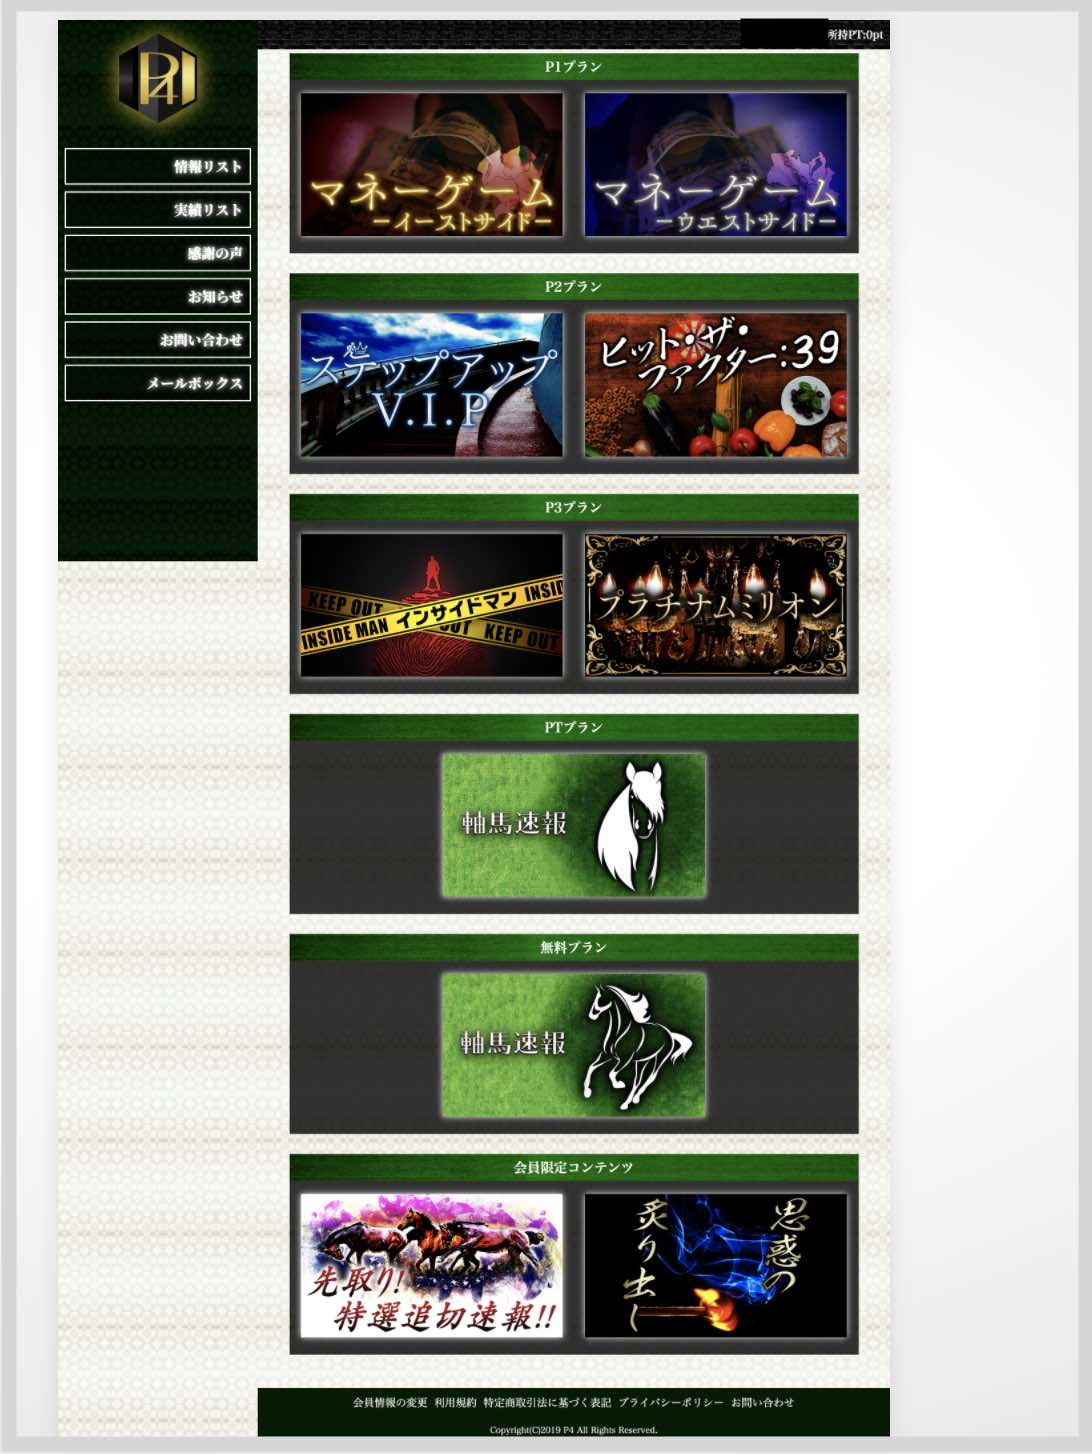 P4という競馬予想サイトの会員ページ